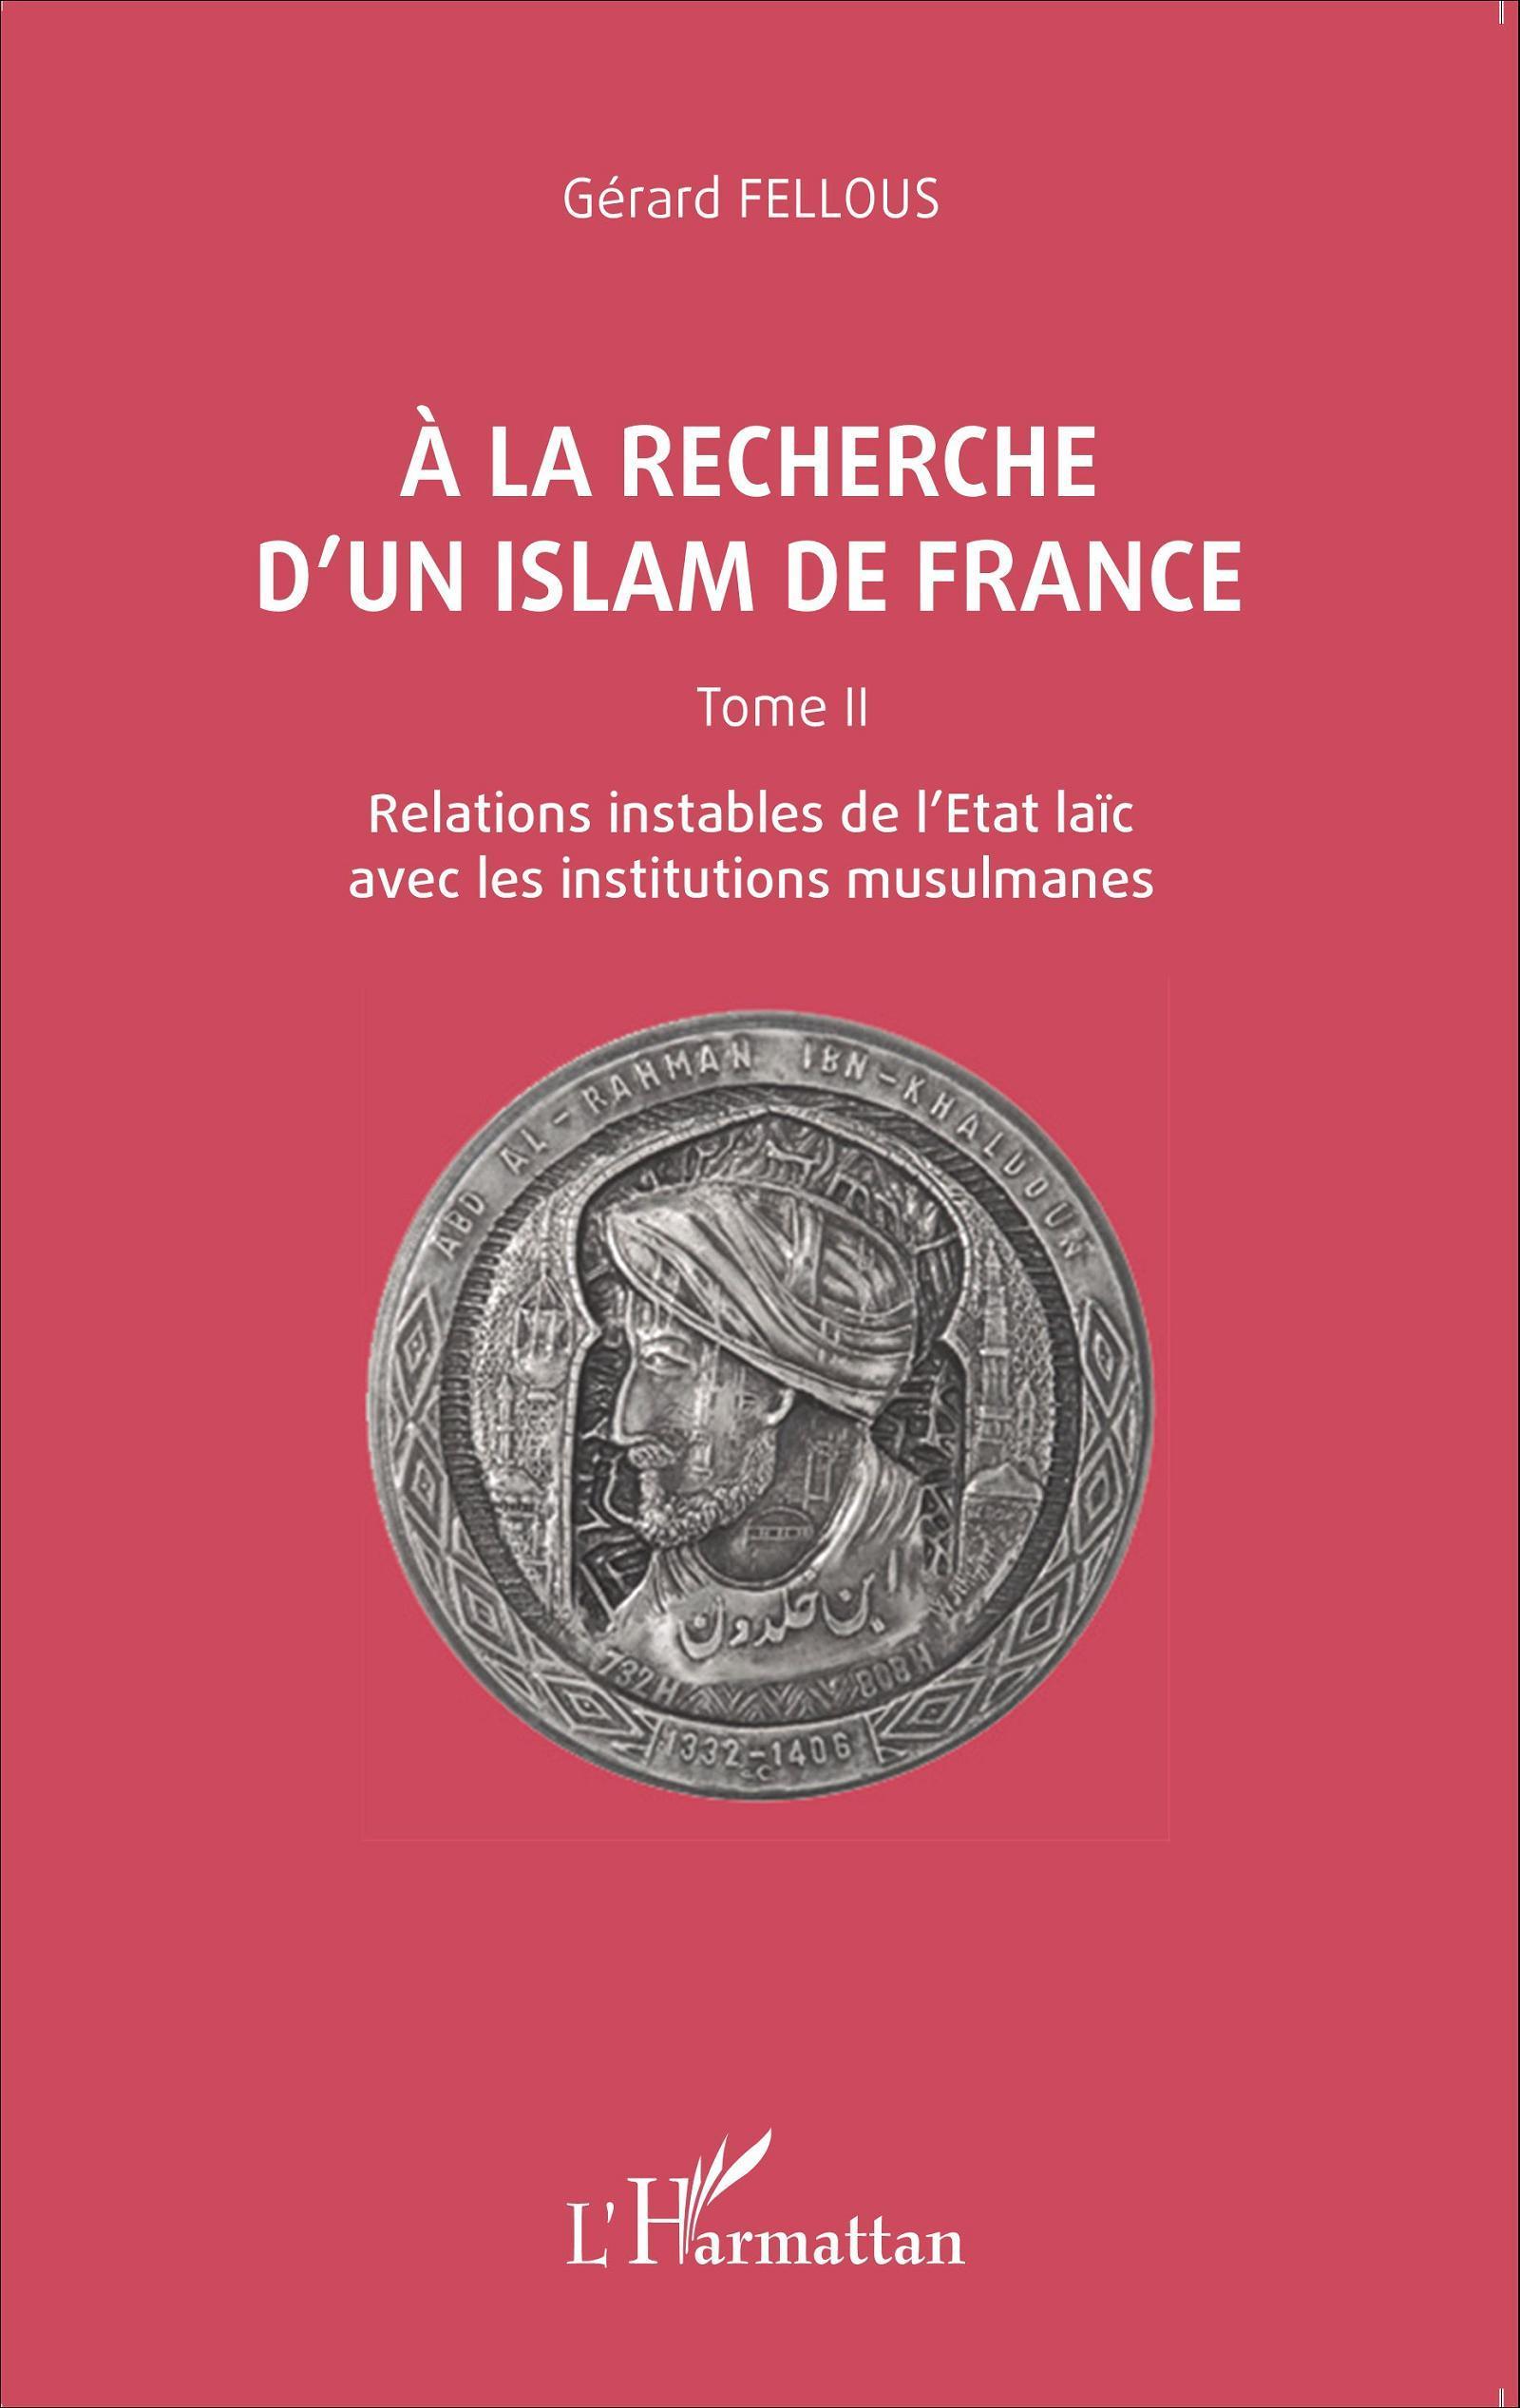 A LA RECHERCHE D'UN ISLAM (T 2) DE FRANCE RELATIONS INSTABLES DE L'ETAT LAIC AVEC LES INSTITUTIONS M